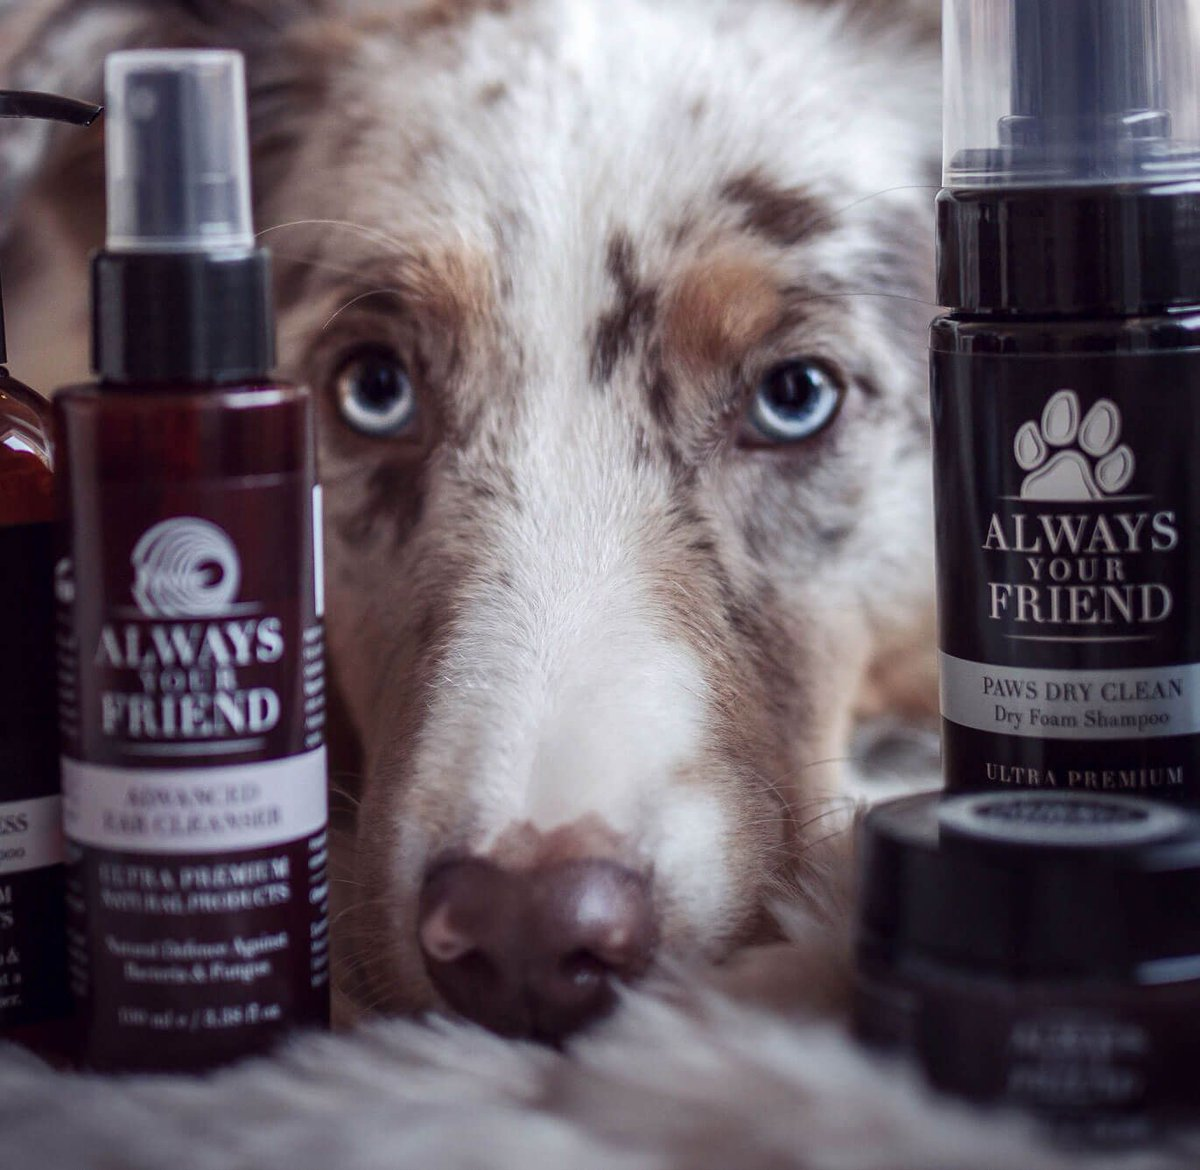 9332bb44adf0 ... oils. https   buff.ly 2CDELOY  dogs  dogshampoo  petcare  dogscare   aloevera  oliveoil  essentialoils  handmade   Cretepic.twitter.com nKQhHh7tTL